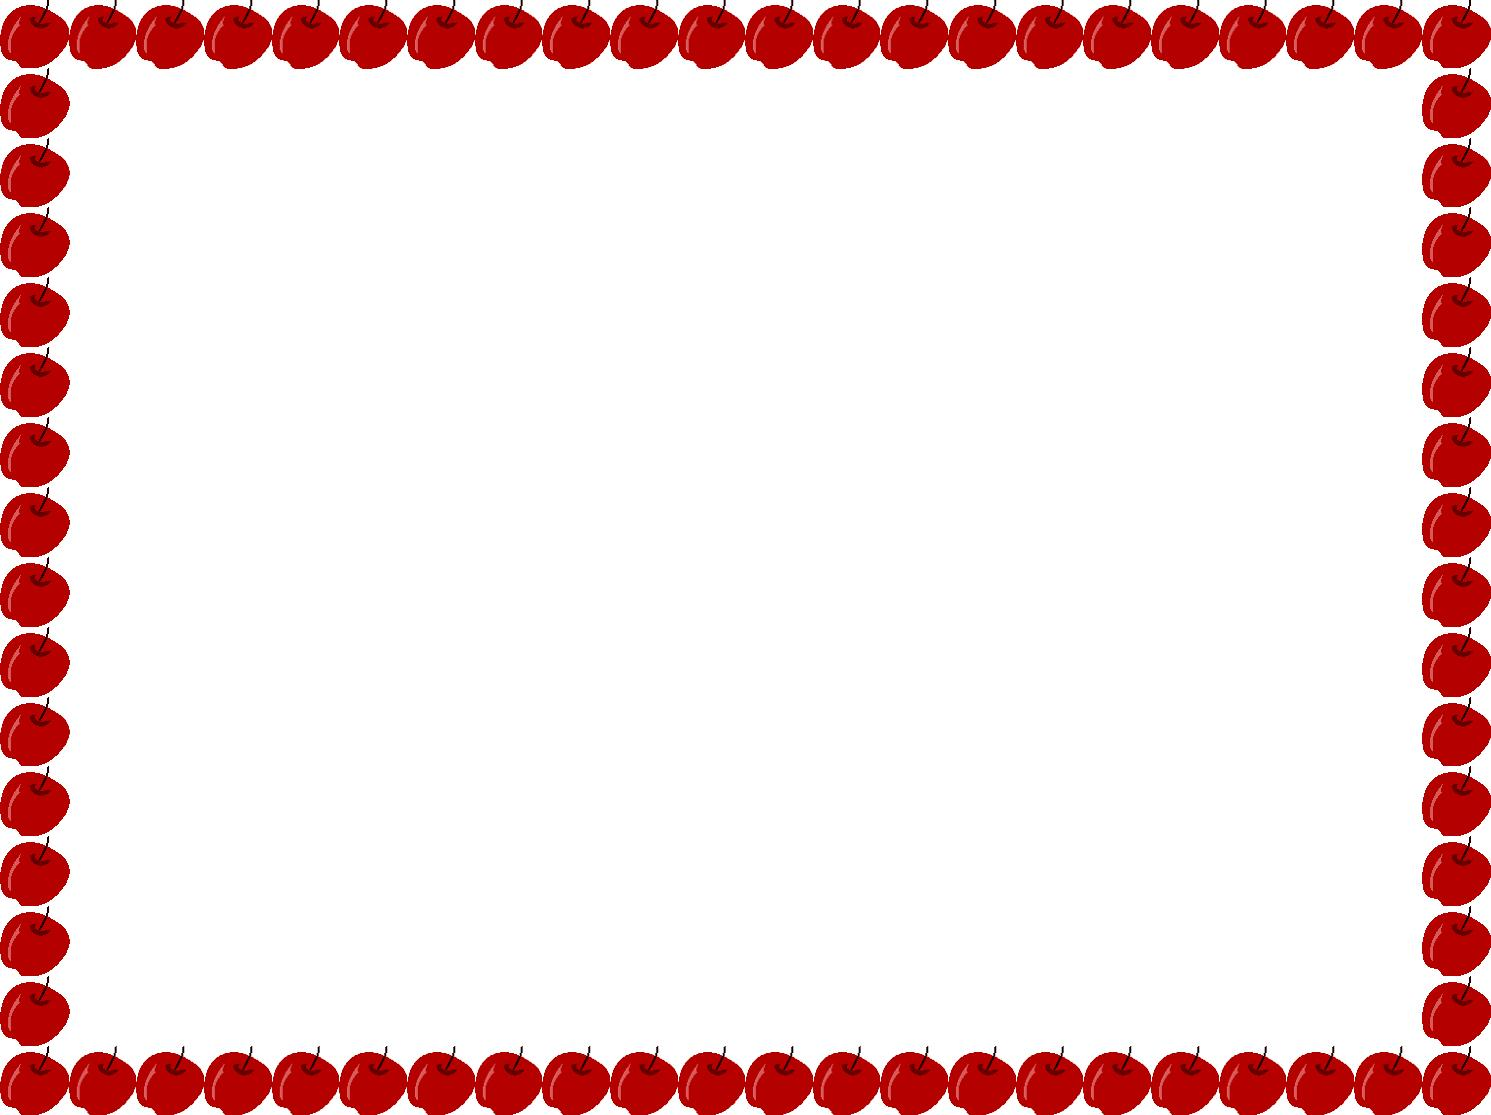 1491x1115 Apple Border Clip Art 3